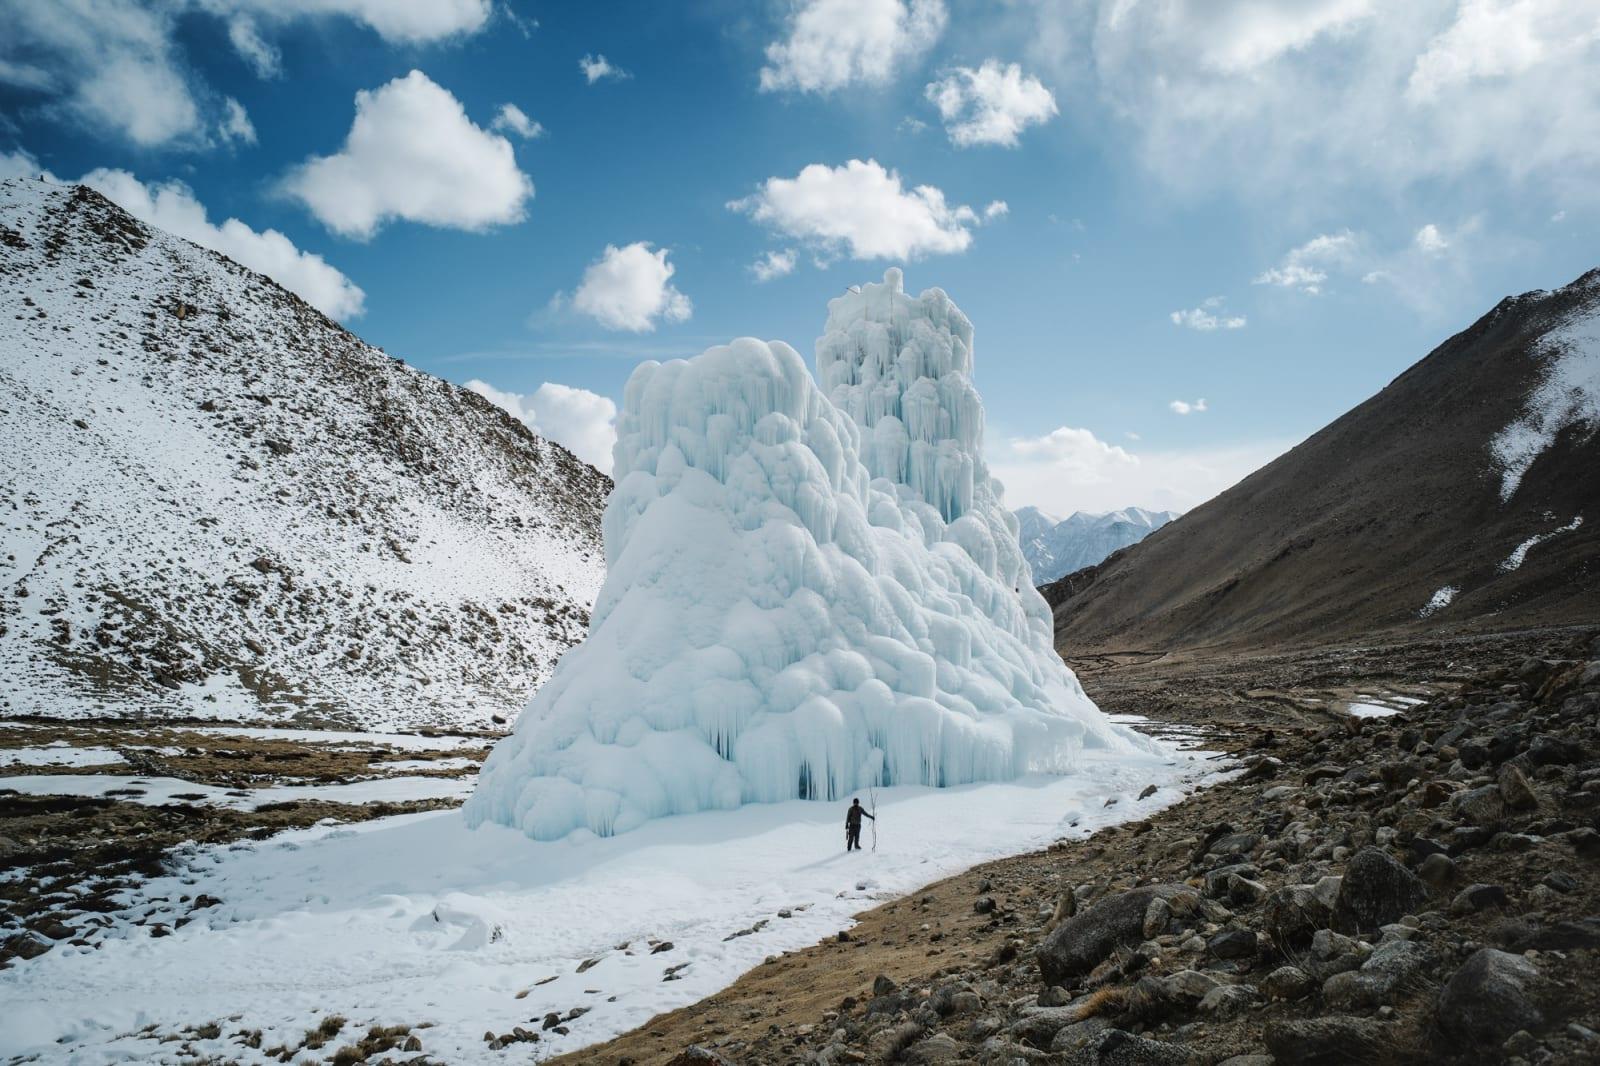 Ciril Jazbec, Ice Stupas #0004, 2018 - 2019